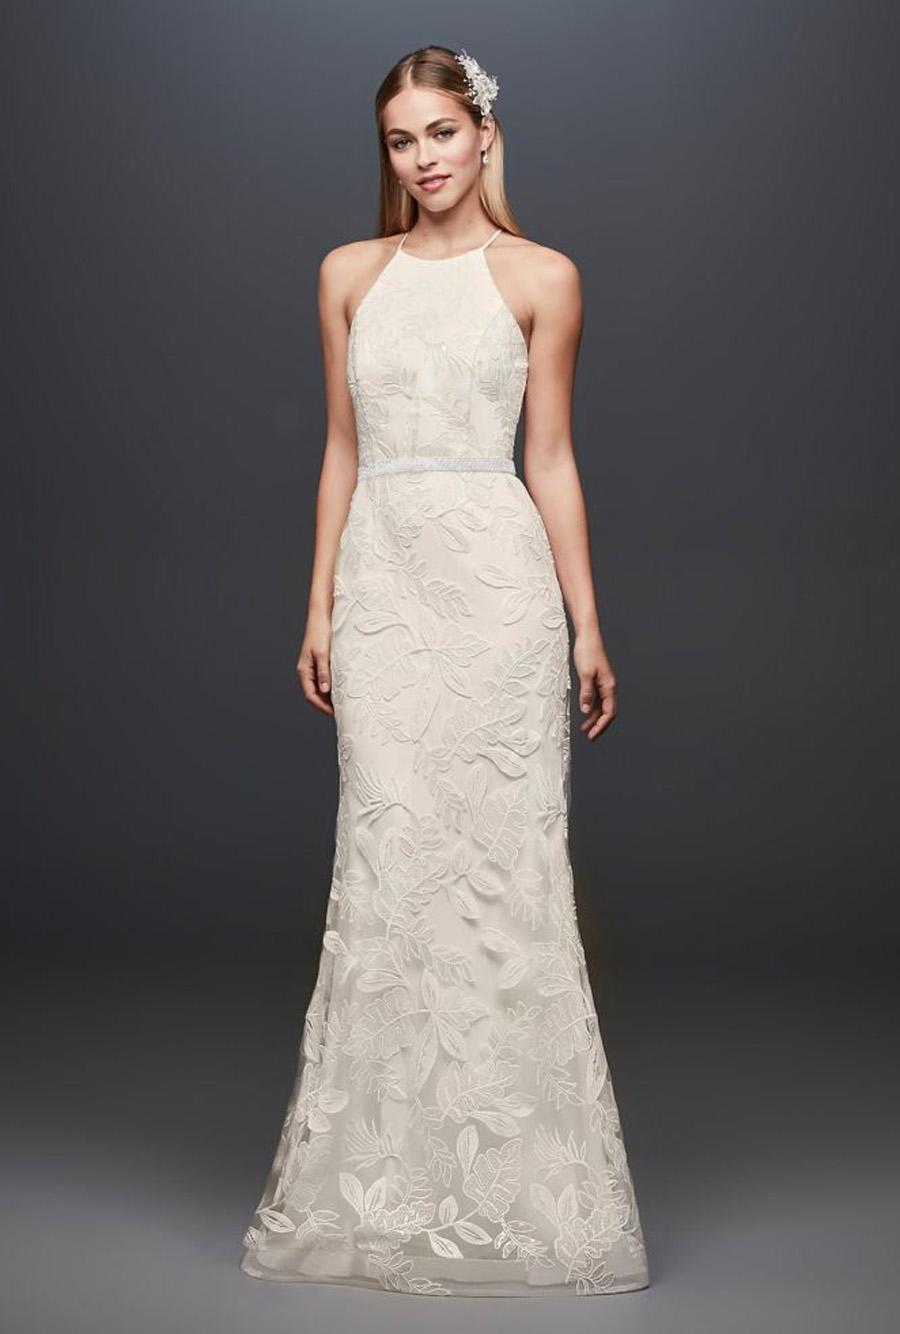 David's Bridal Sequin Leaf-Appliqued Gown